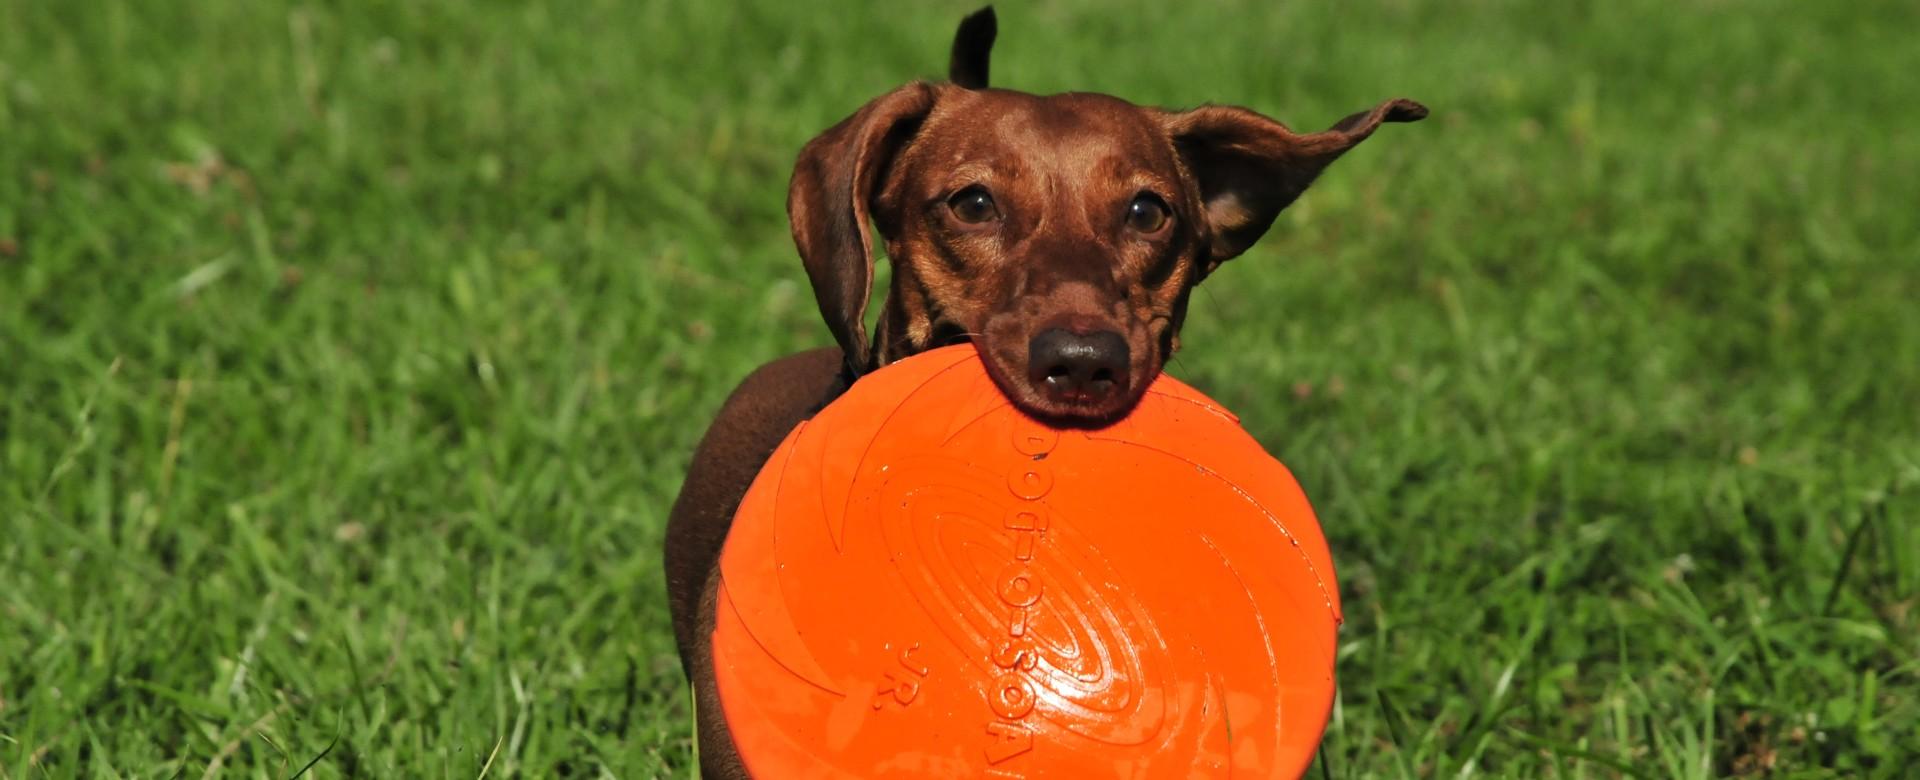 Dachshund with frisbee